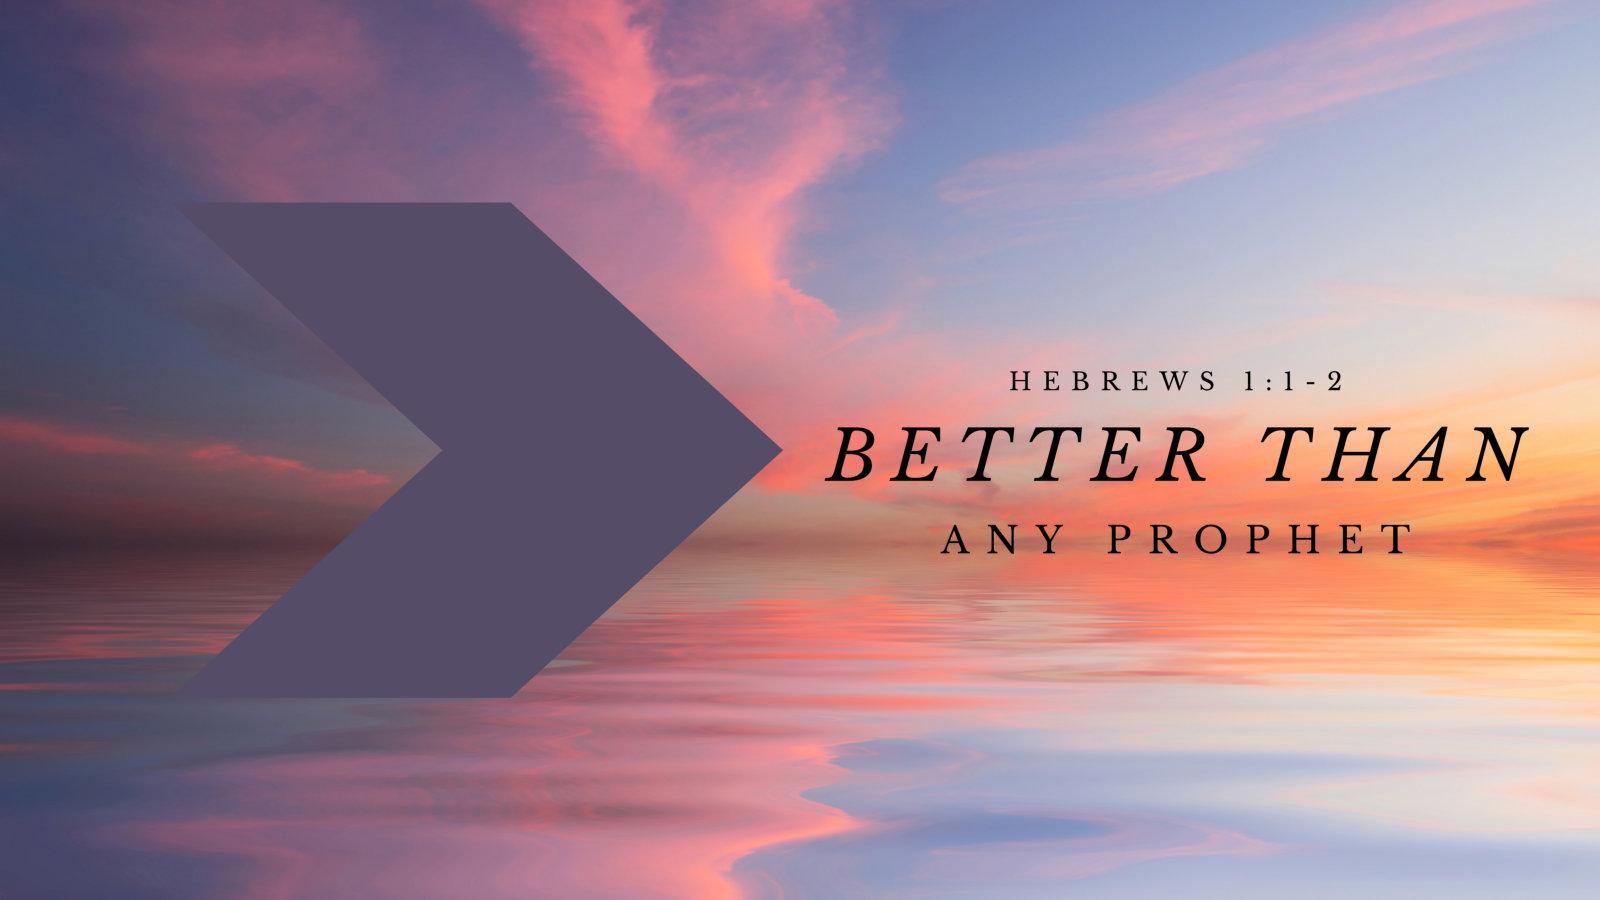 Hebrews_Sermon_Better_Than_any_Prophet